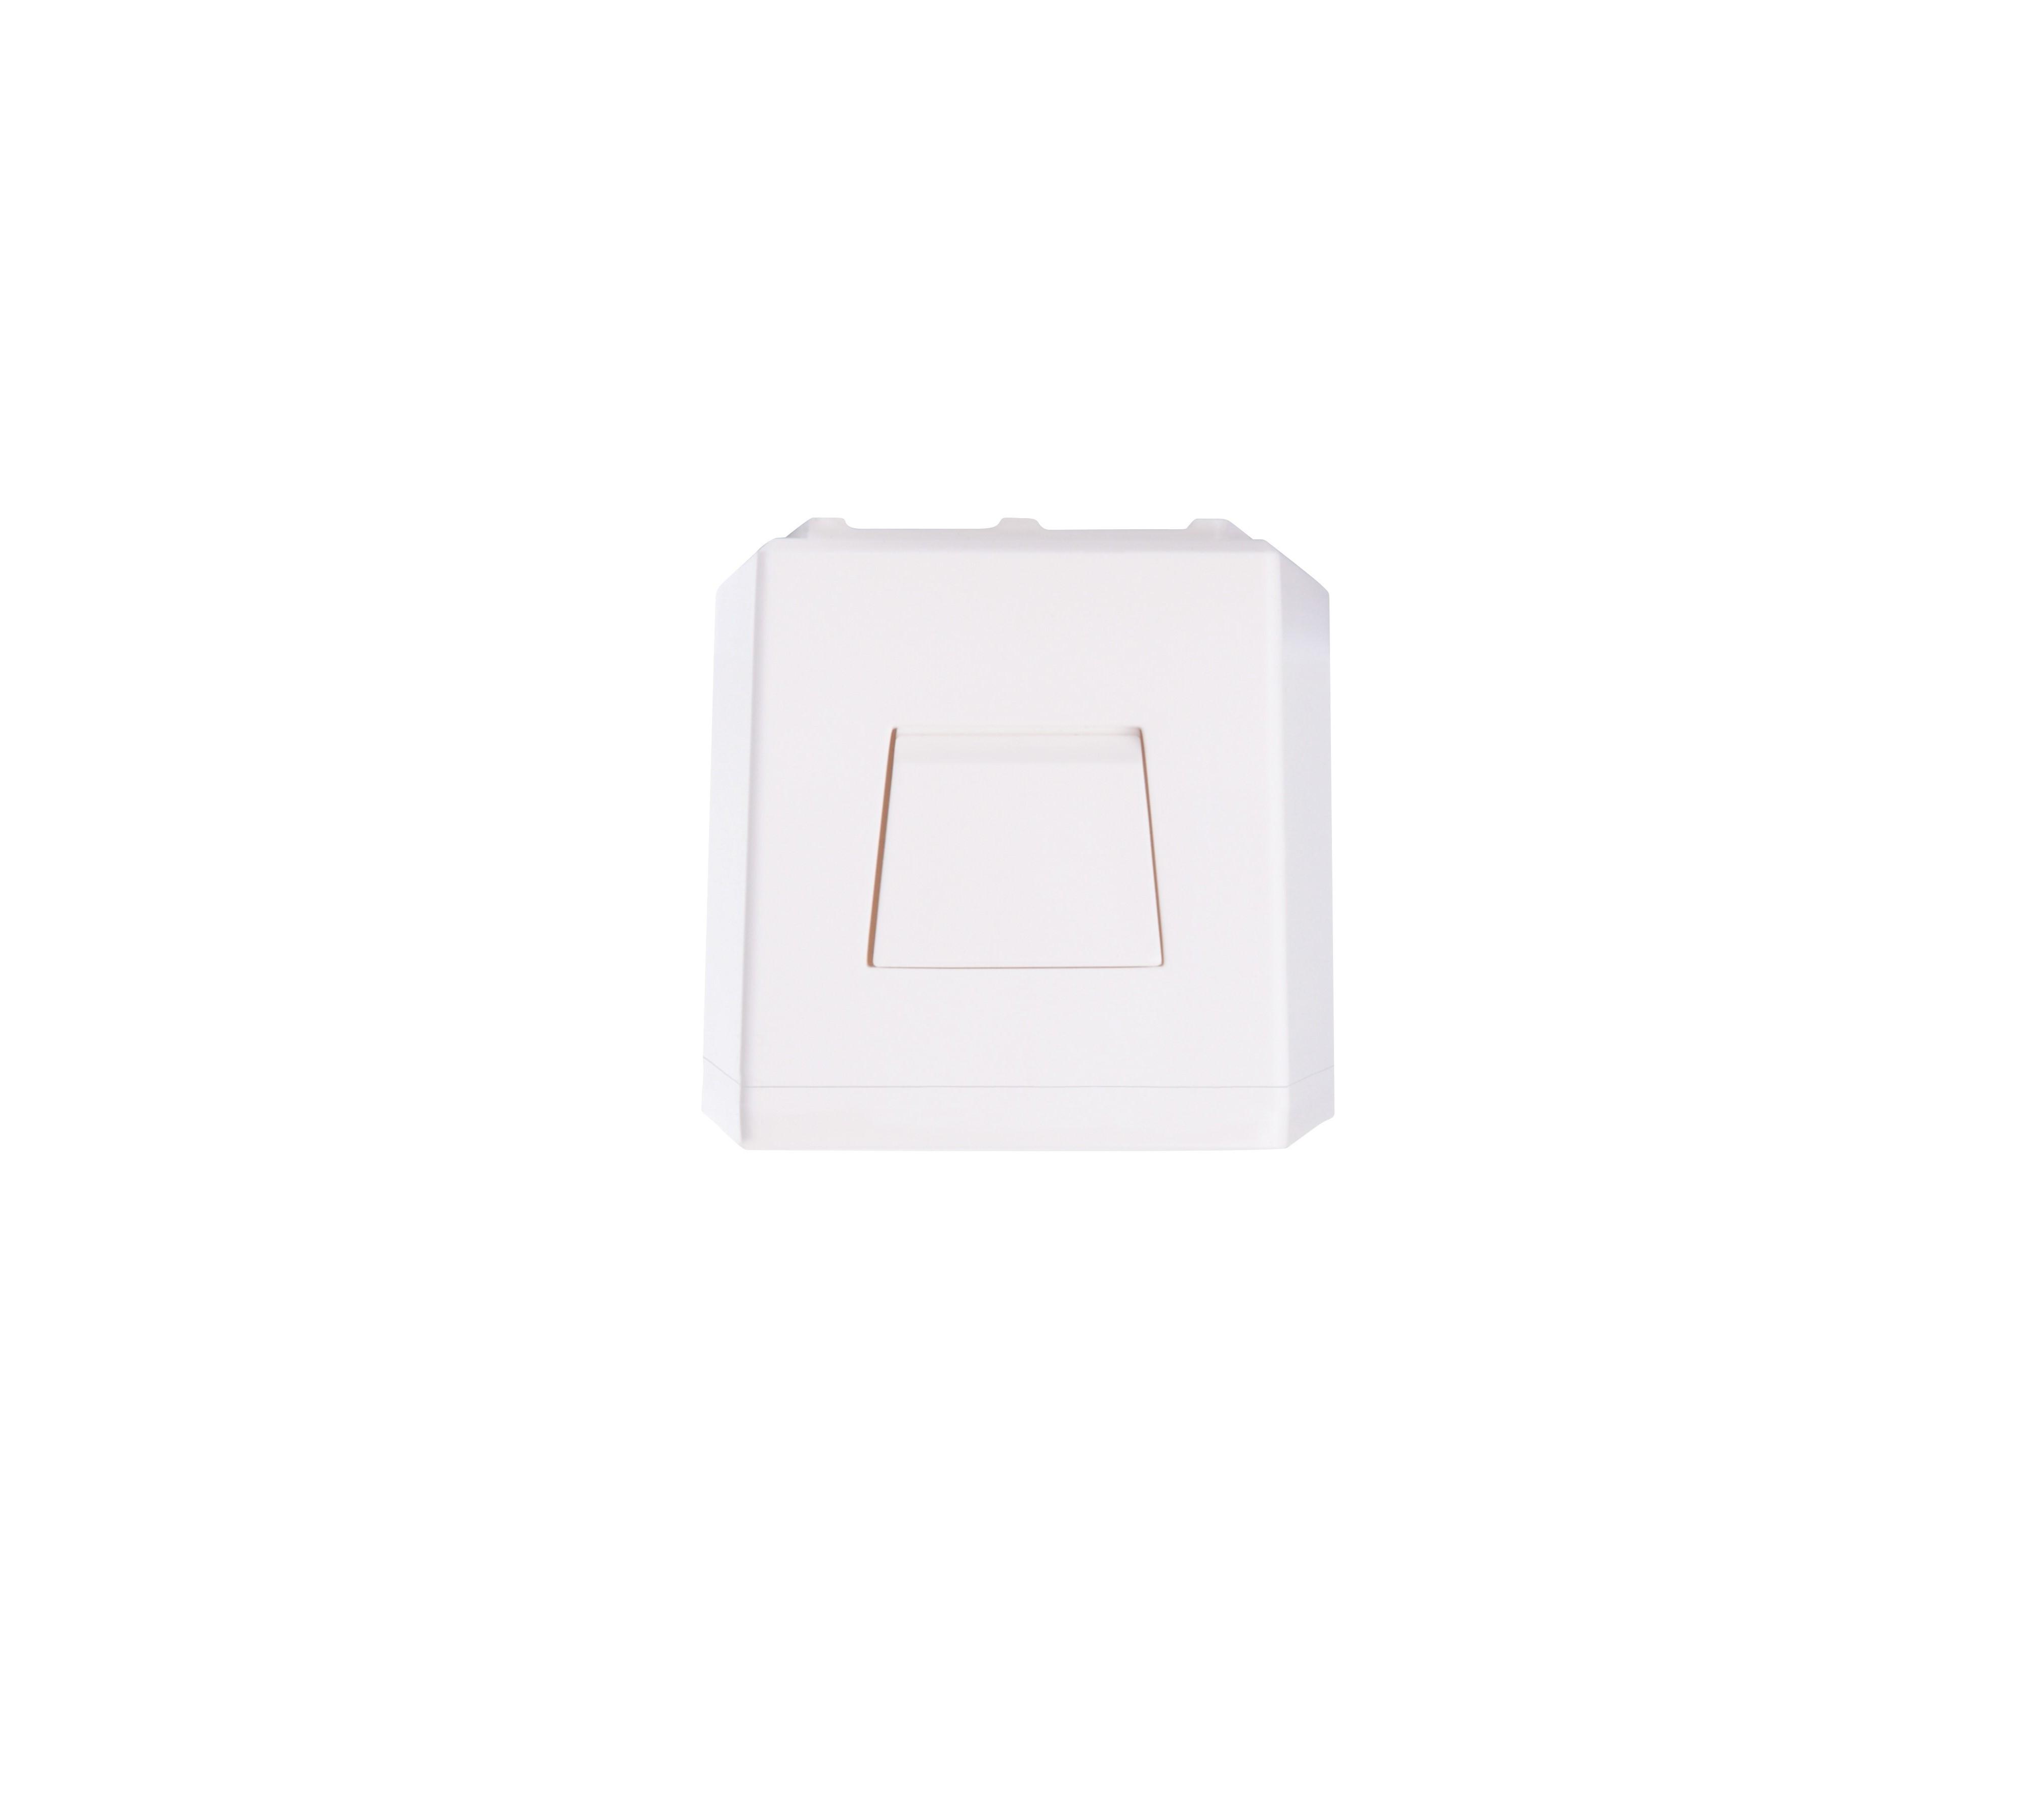 Lampa antipanica led Intelight 94554   3h mentinut test automat 1